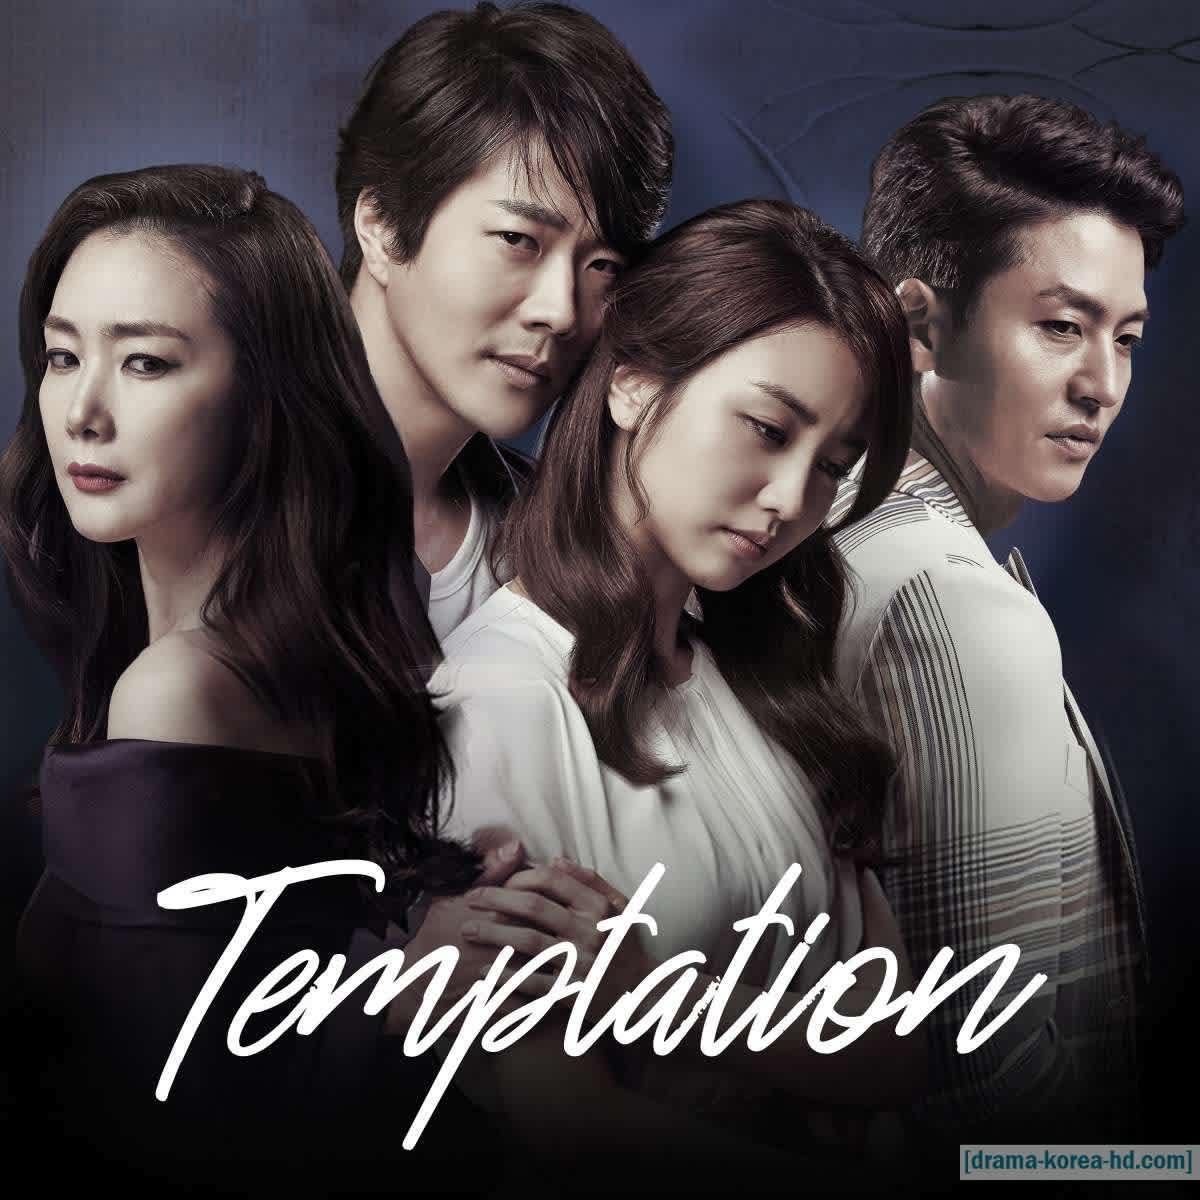 Temptation - Complete Episode drama korea